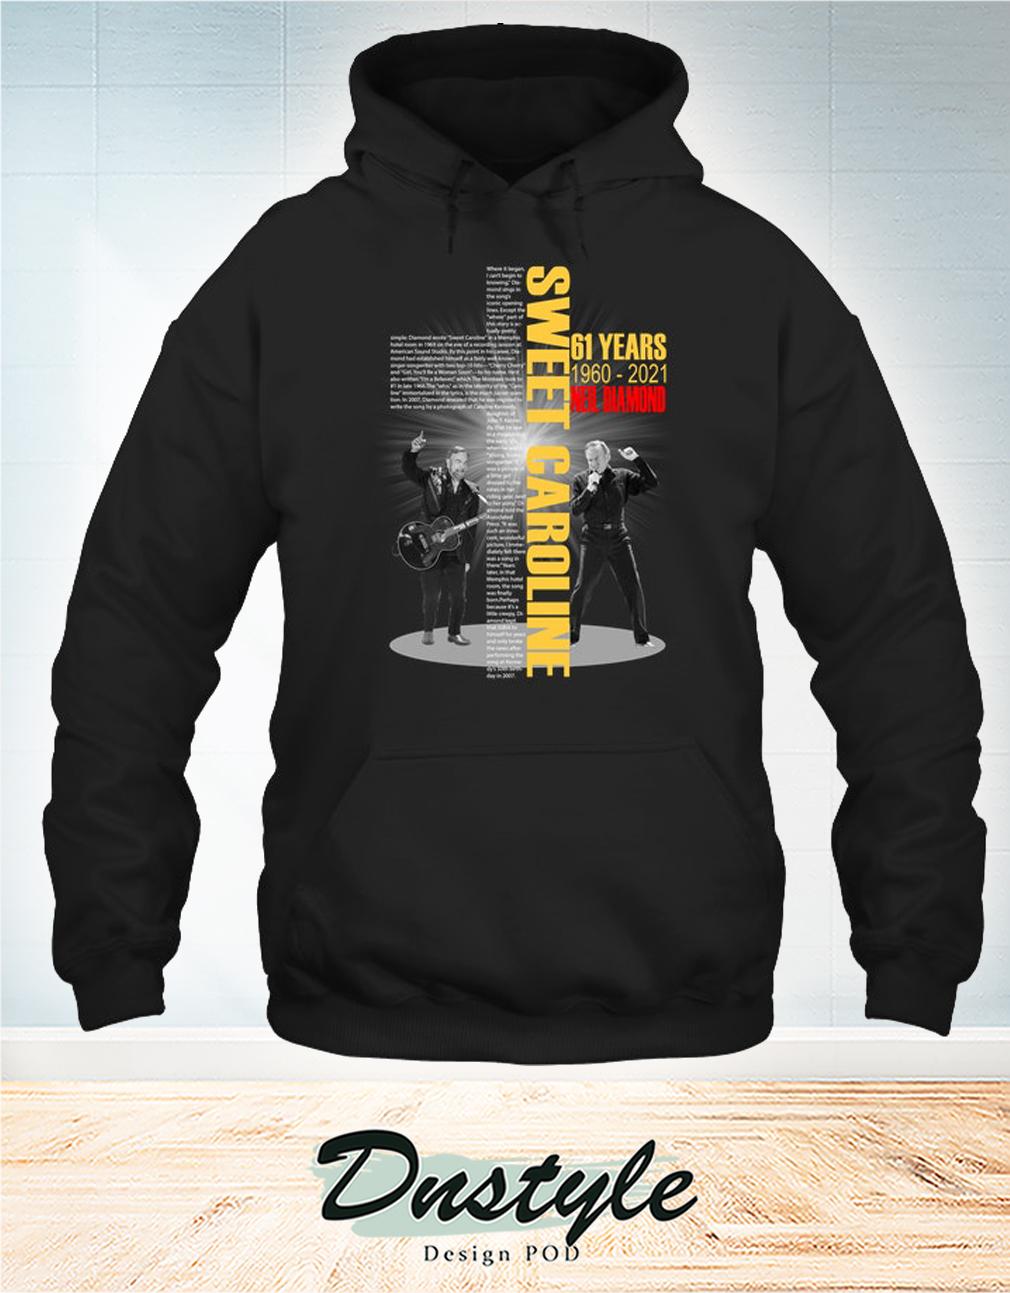 Sweet caroline lyrics Neil diamond 61 years hoodie